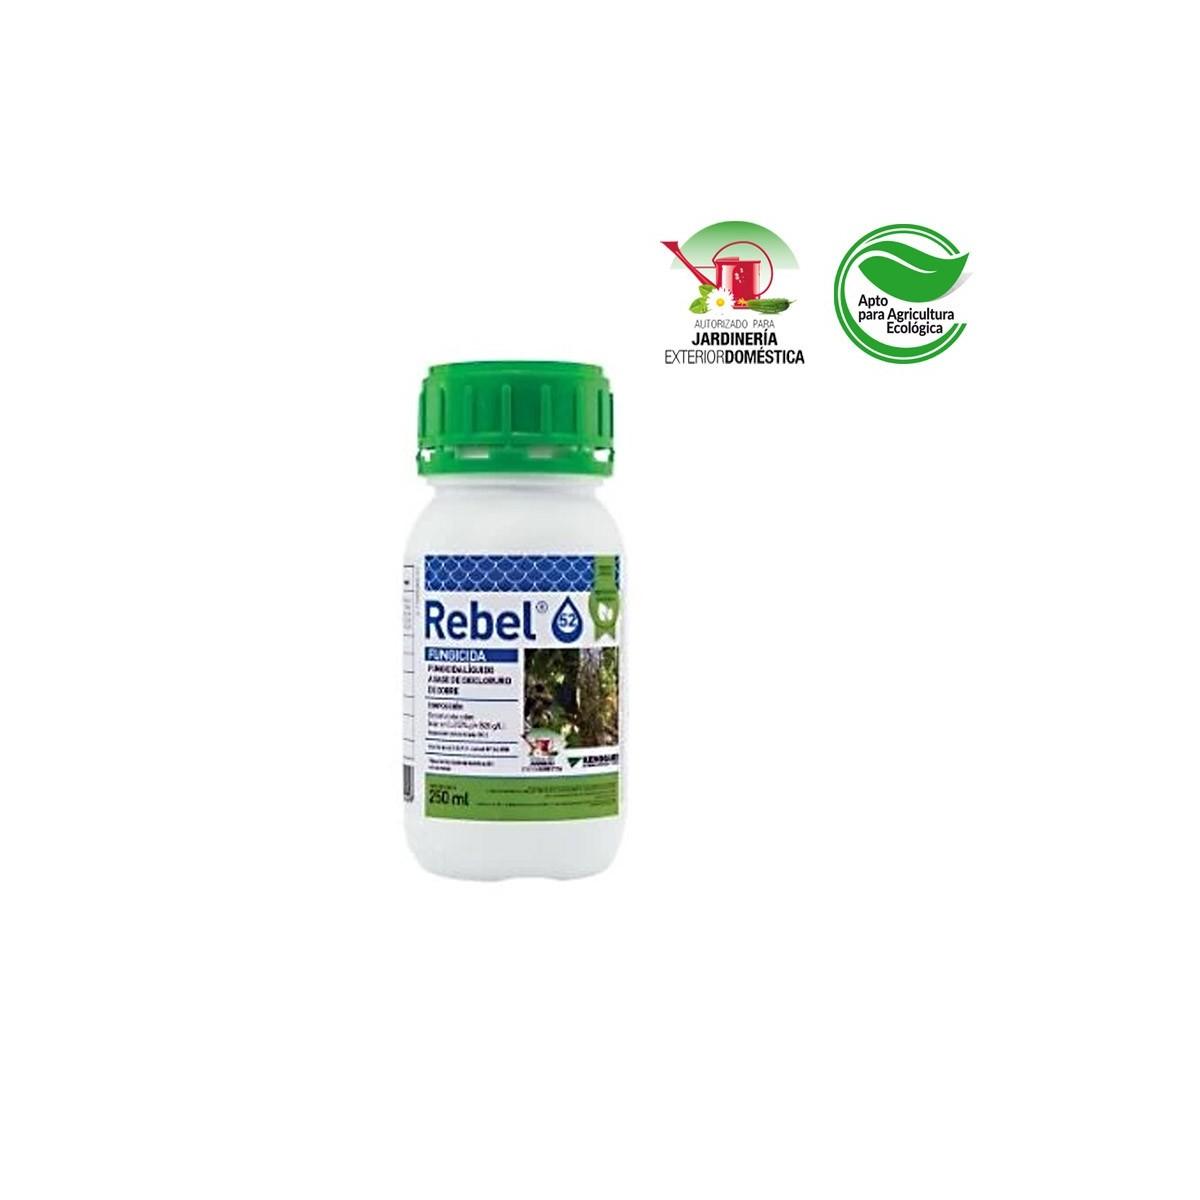 Fungicida rebel 52 250ml (oxicloruro de cobre)